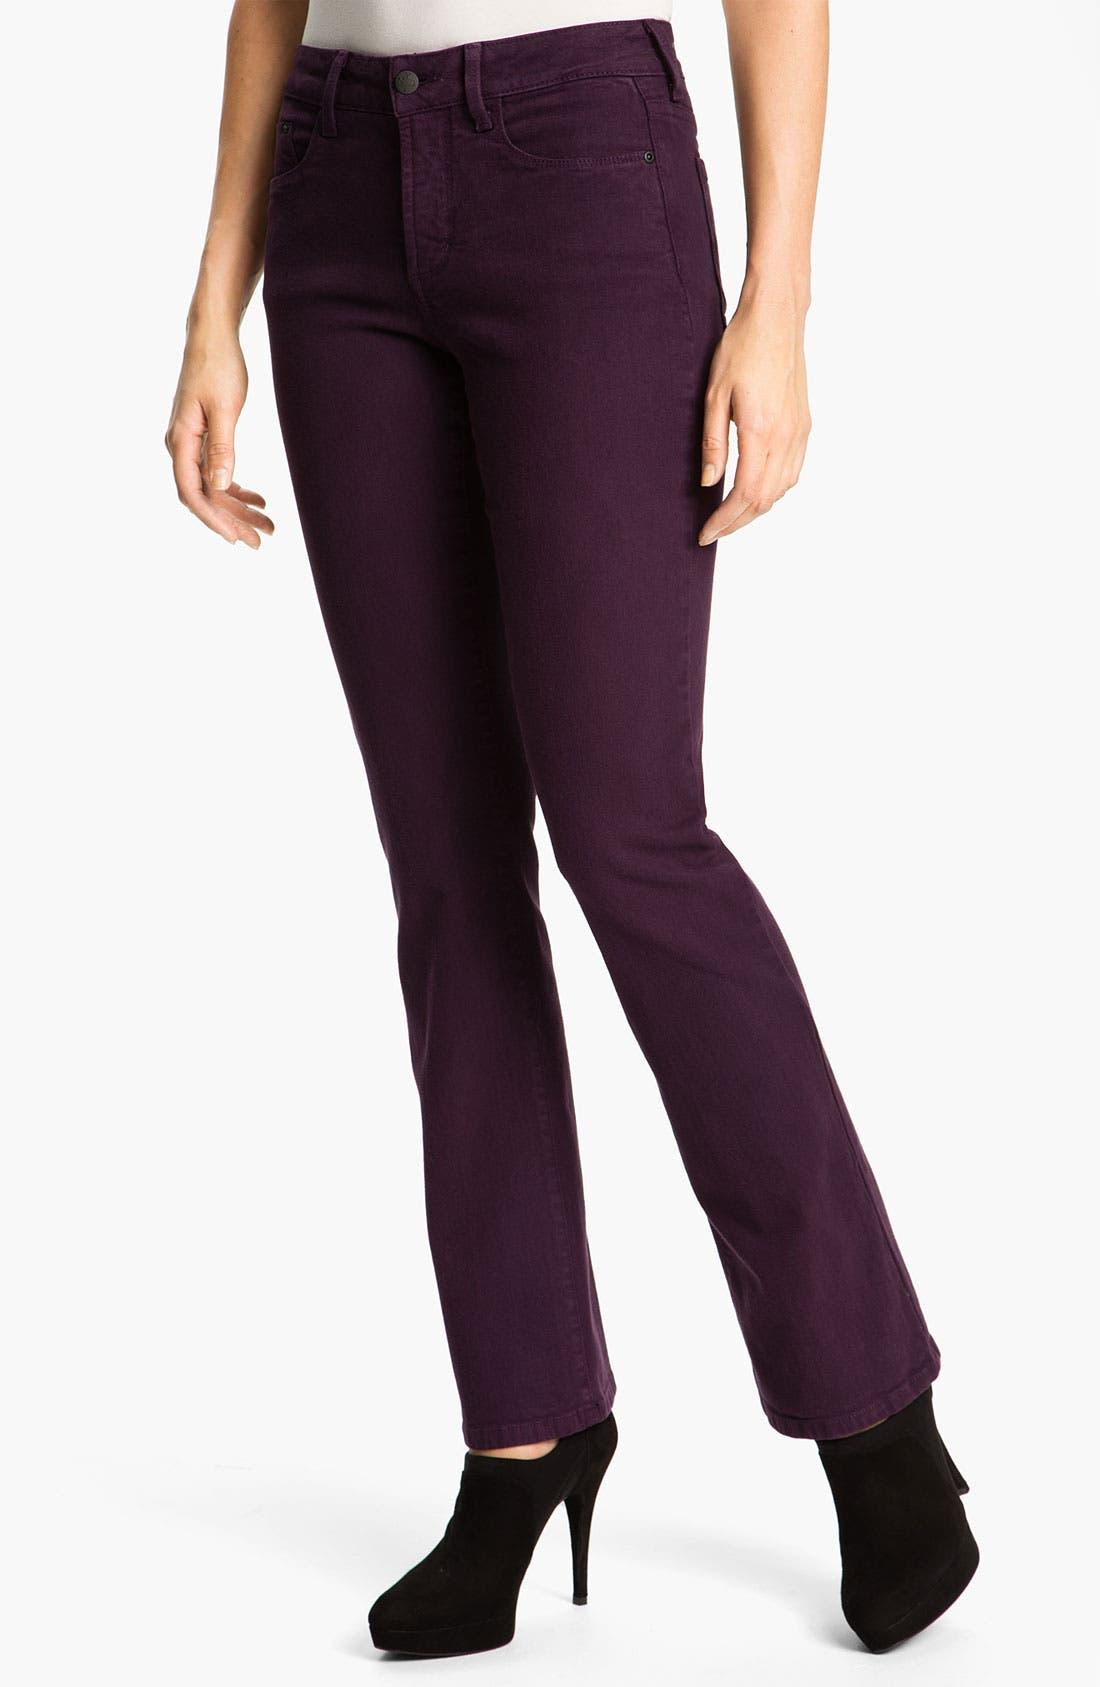 Alternate Image 1 Selected - NYDJ 'Barbara' Colored Denim Bootcut Jeans